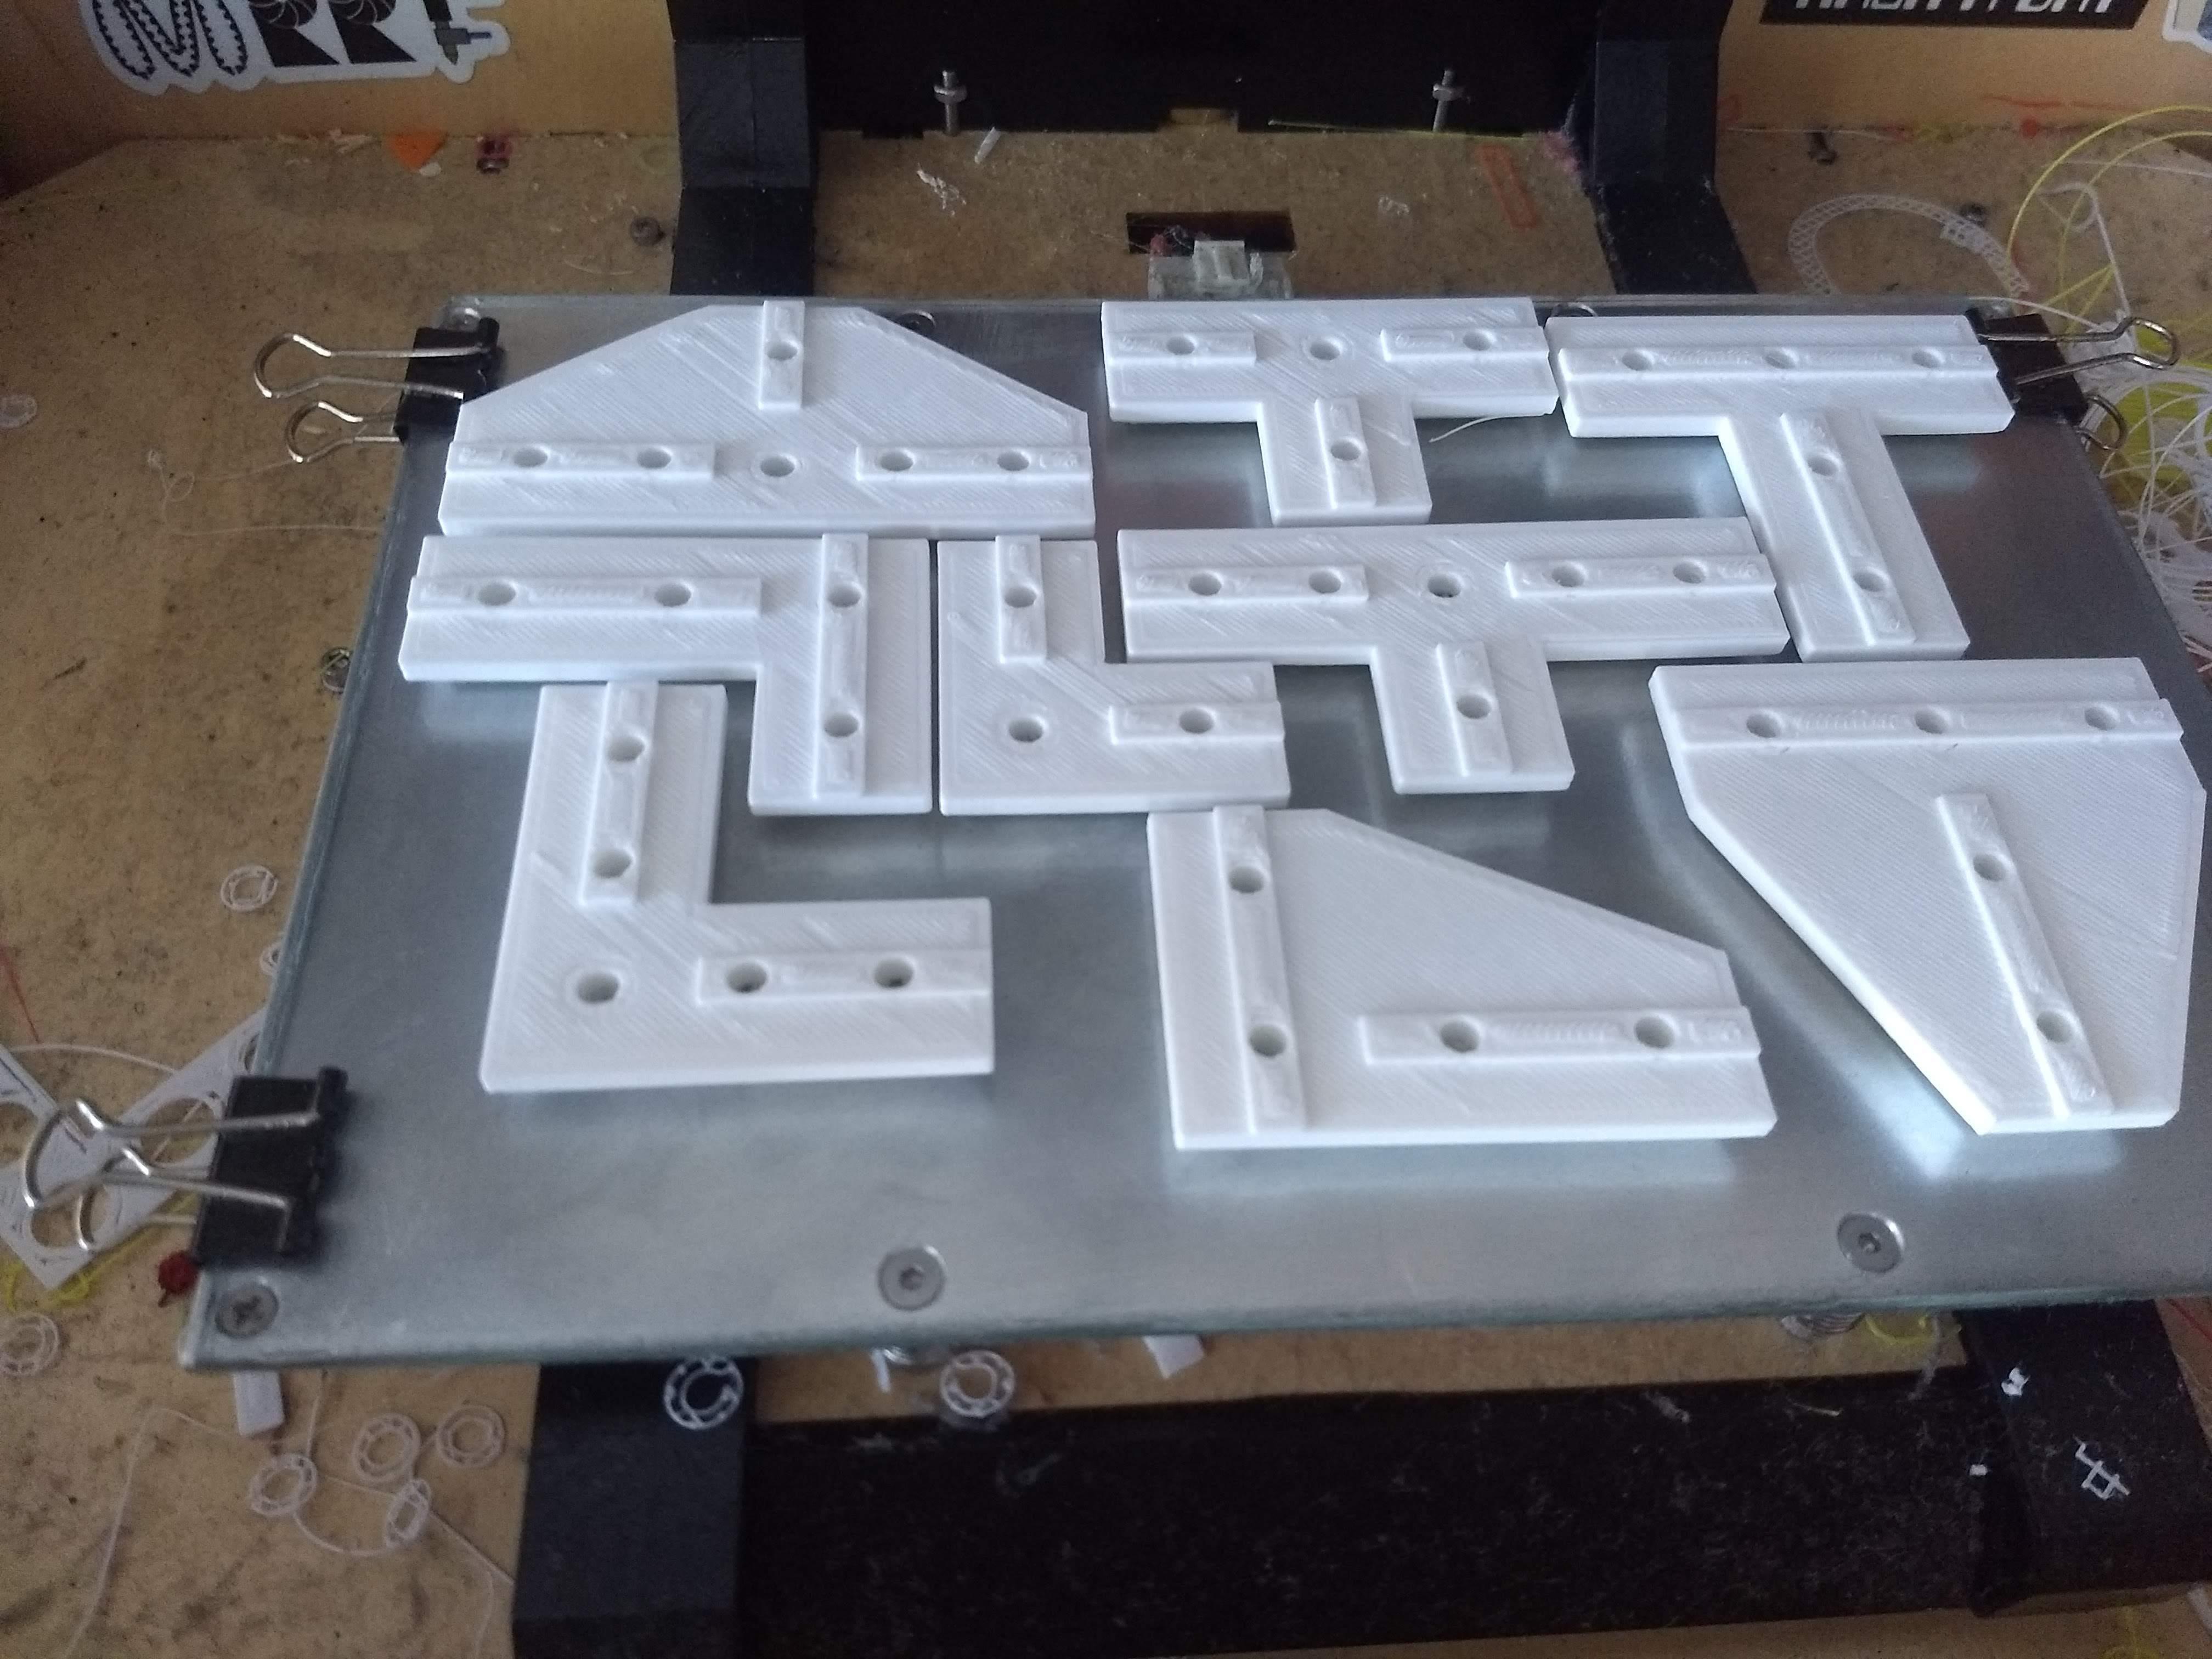 IMG_20200121_123457624_BURST000_COVER_TOP.jpg Download free STL file 2020 Profile Aluminum 3D Printable Erector Set • 3D printer model, adamjvr